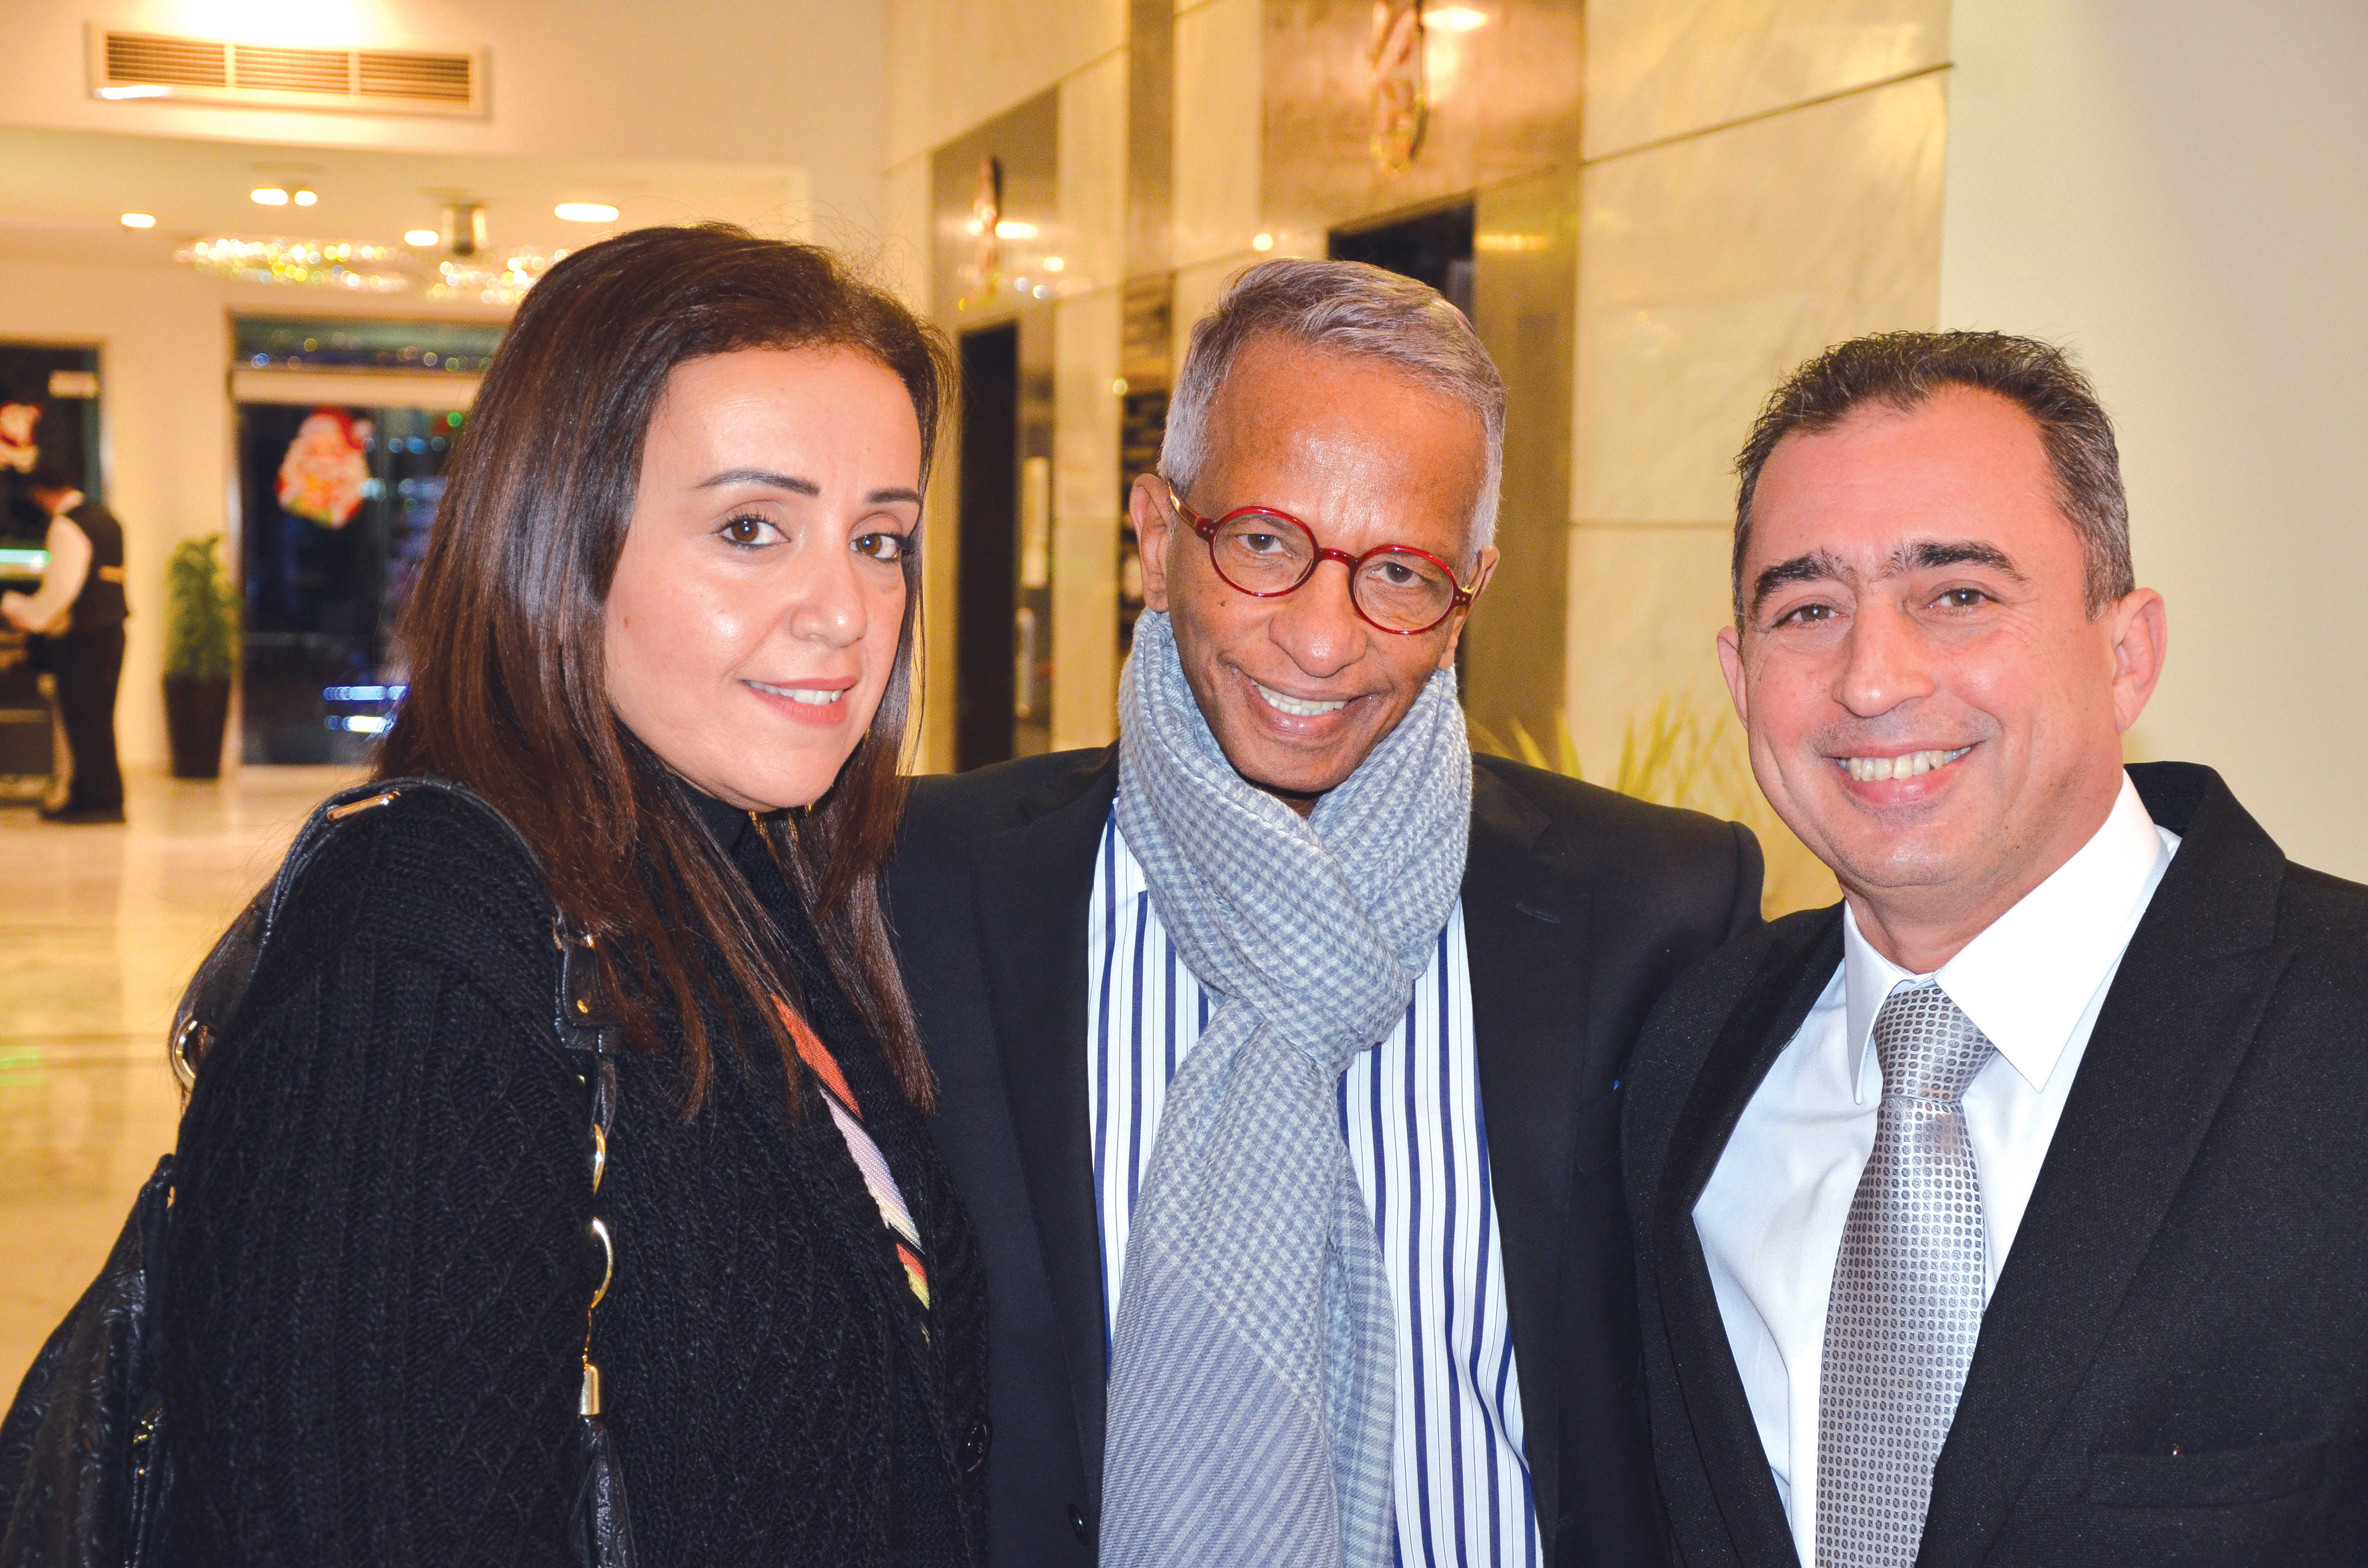 Ms. Nour Alsagheer, Mr. Mohamed Alsagheer & Mr. Mostafa Elkerdany